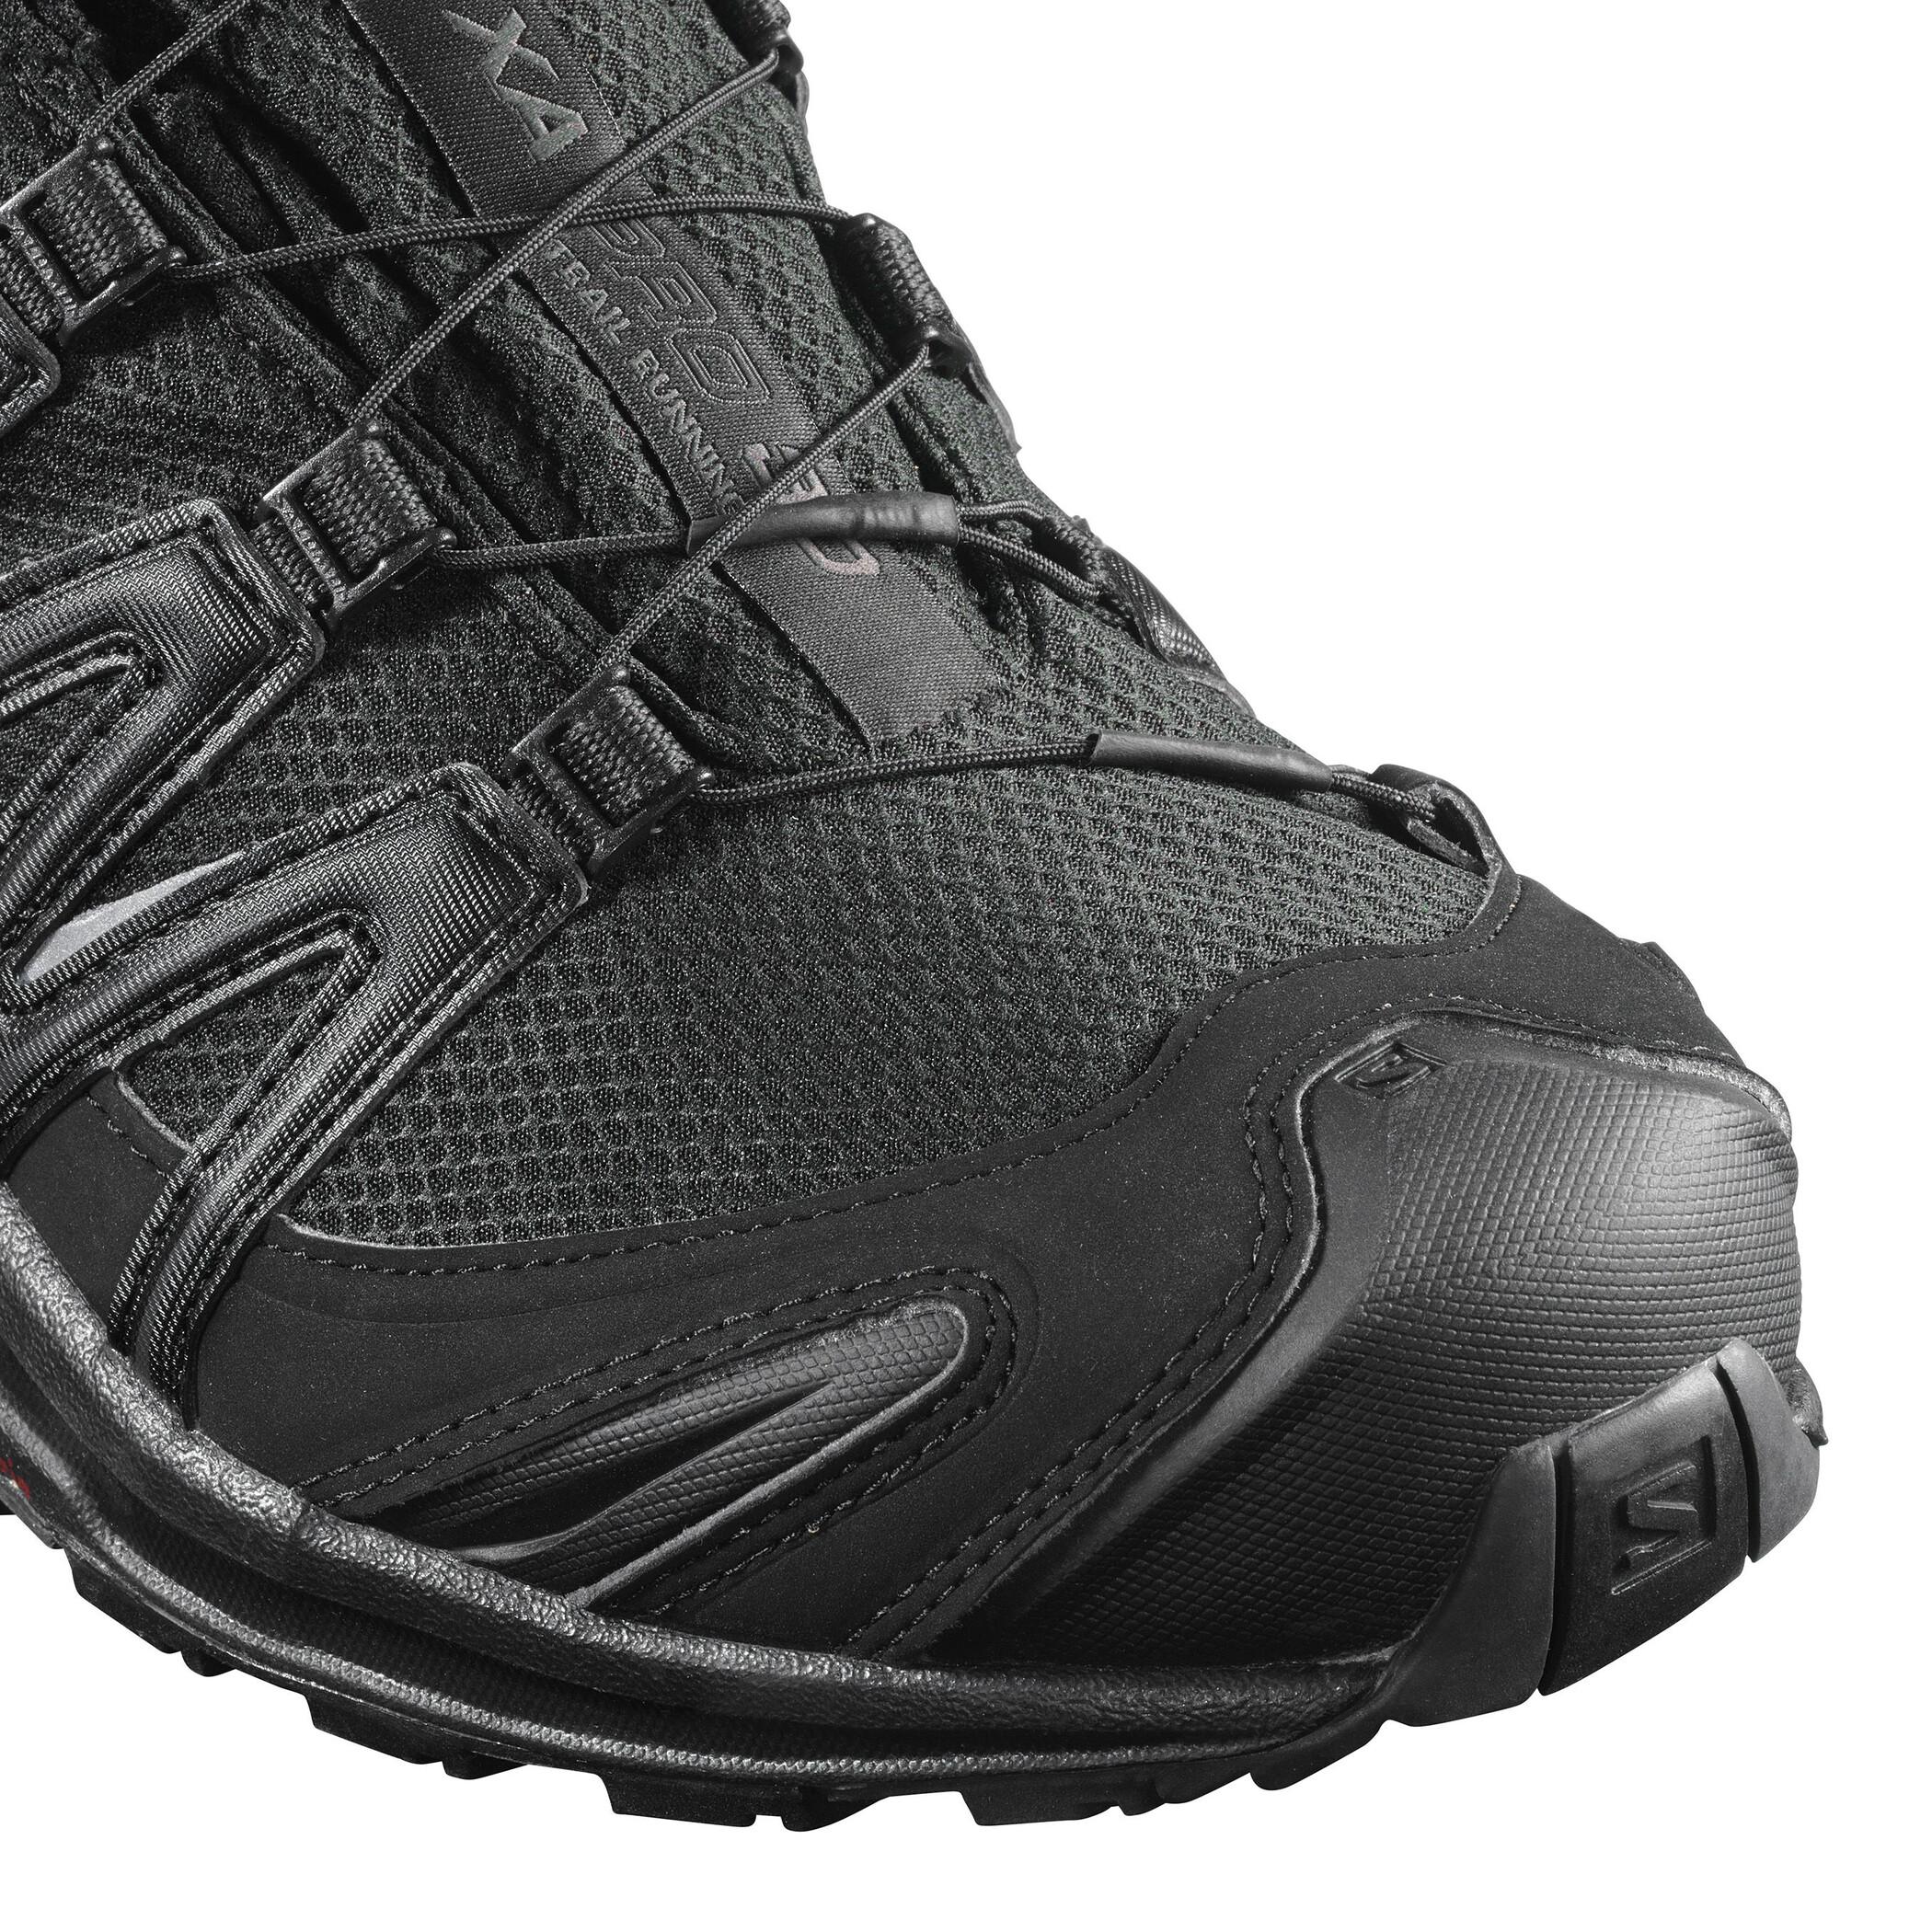 Salomon XA Pro 3D GTX Trailrunning Shoes Men blackblackmagnet